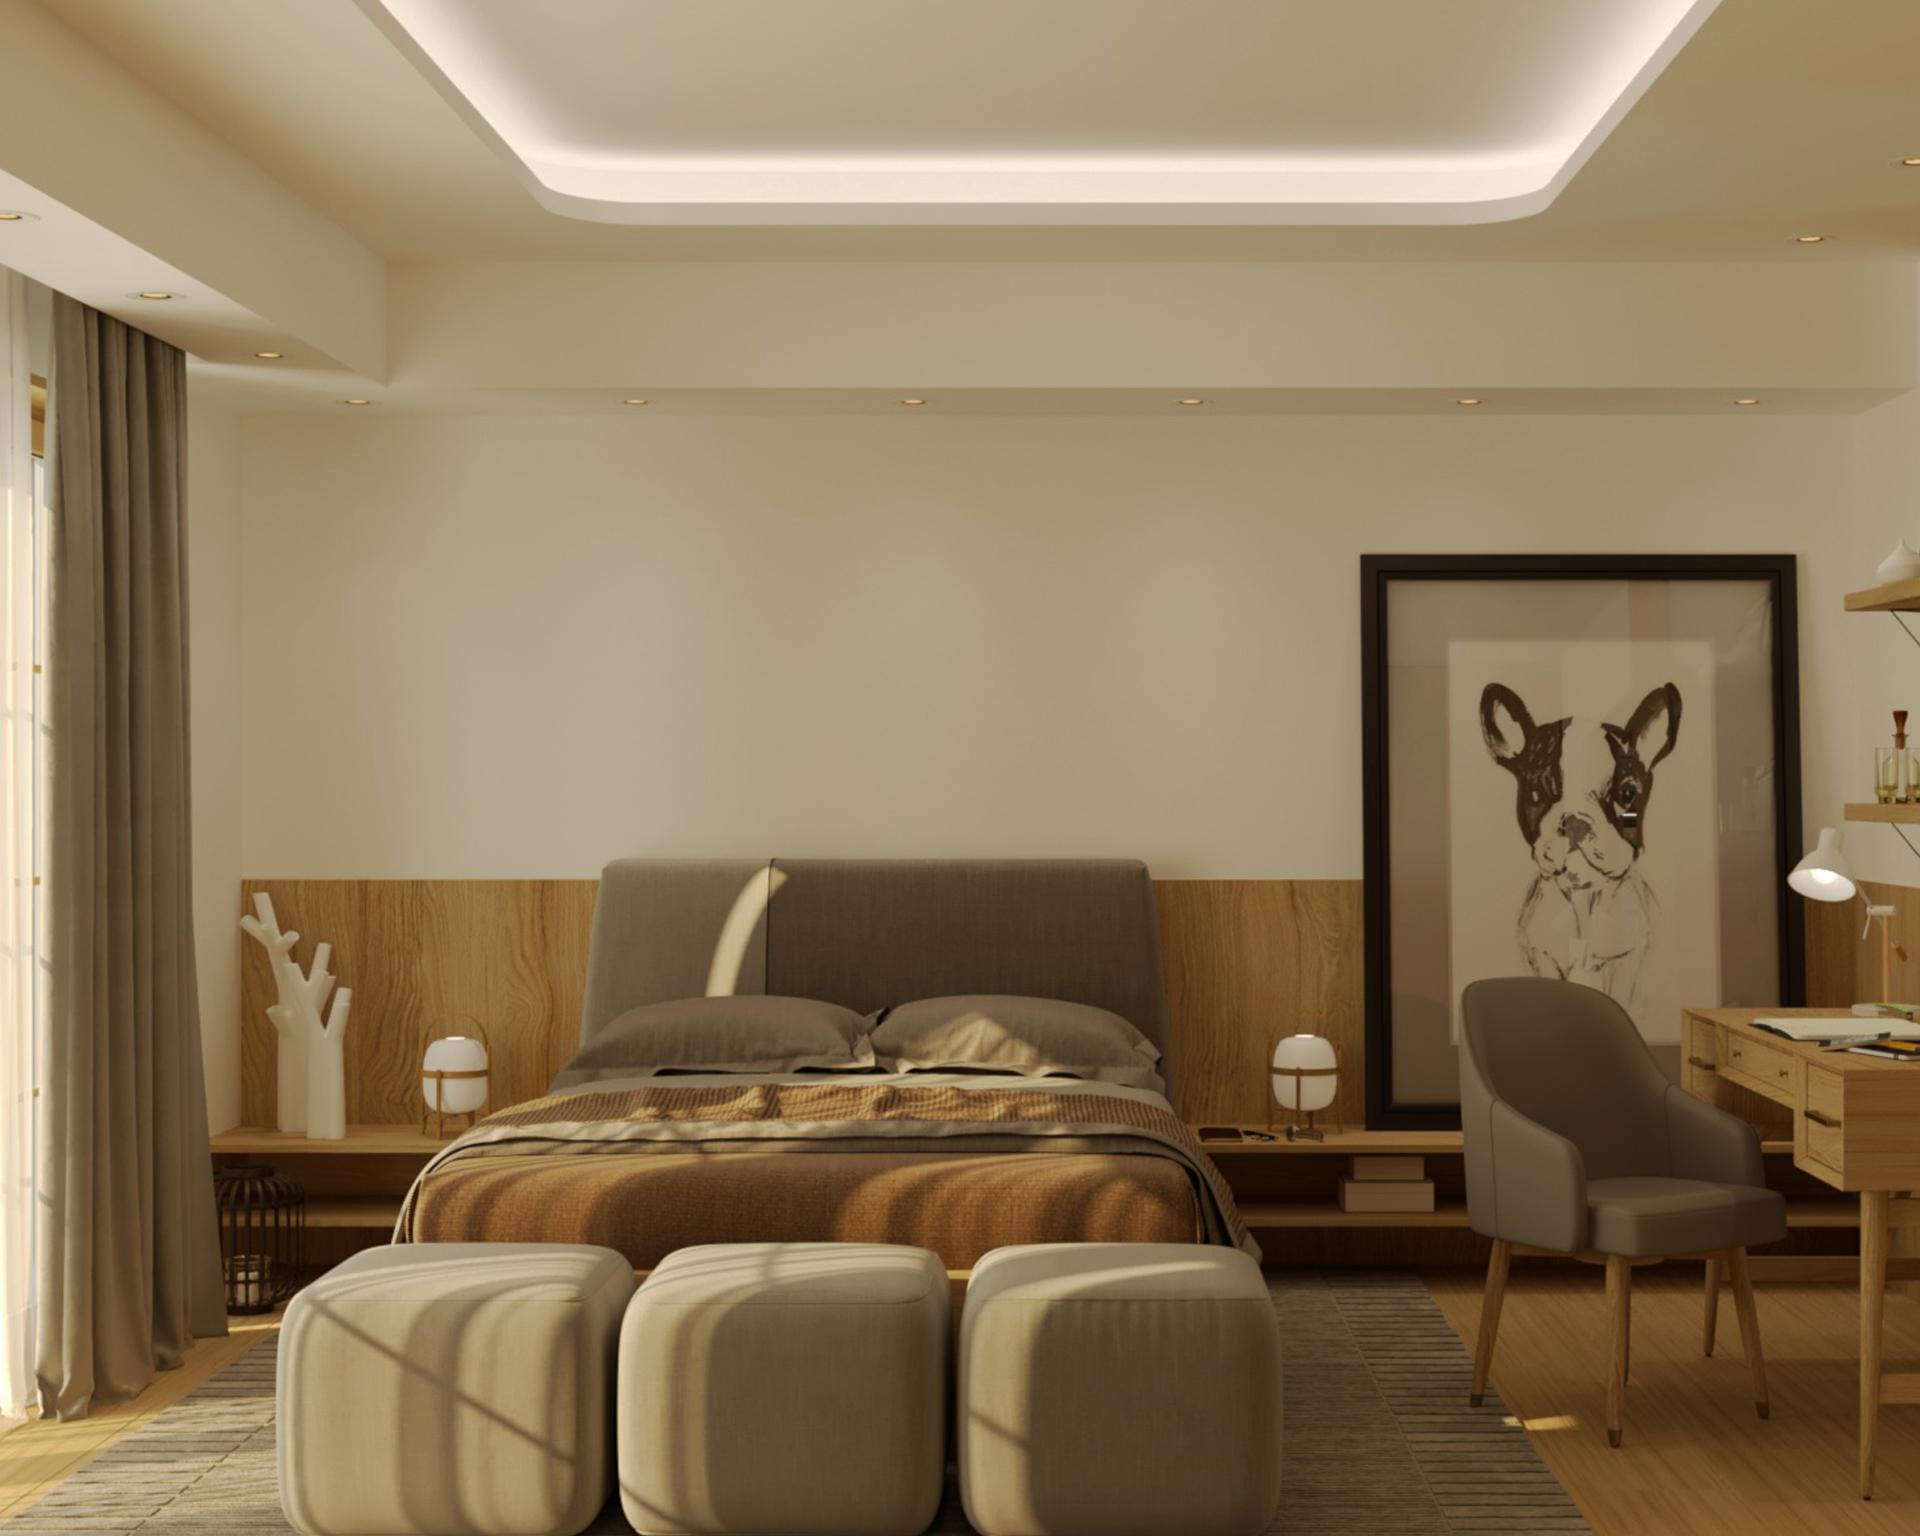 dormitorio-madera-alfonso-perez-alvarez